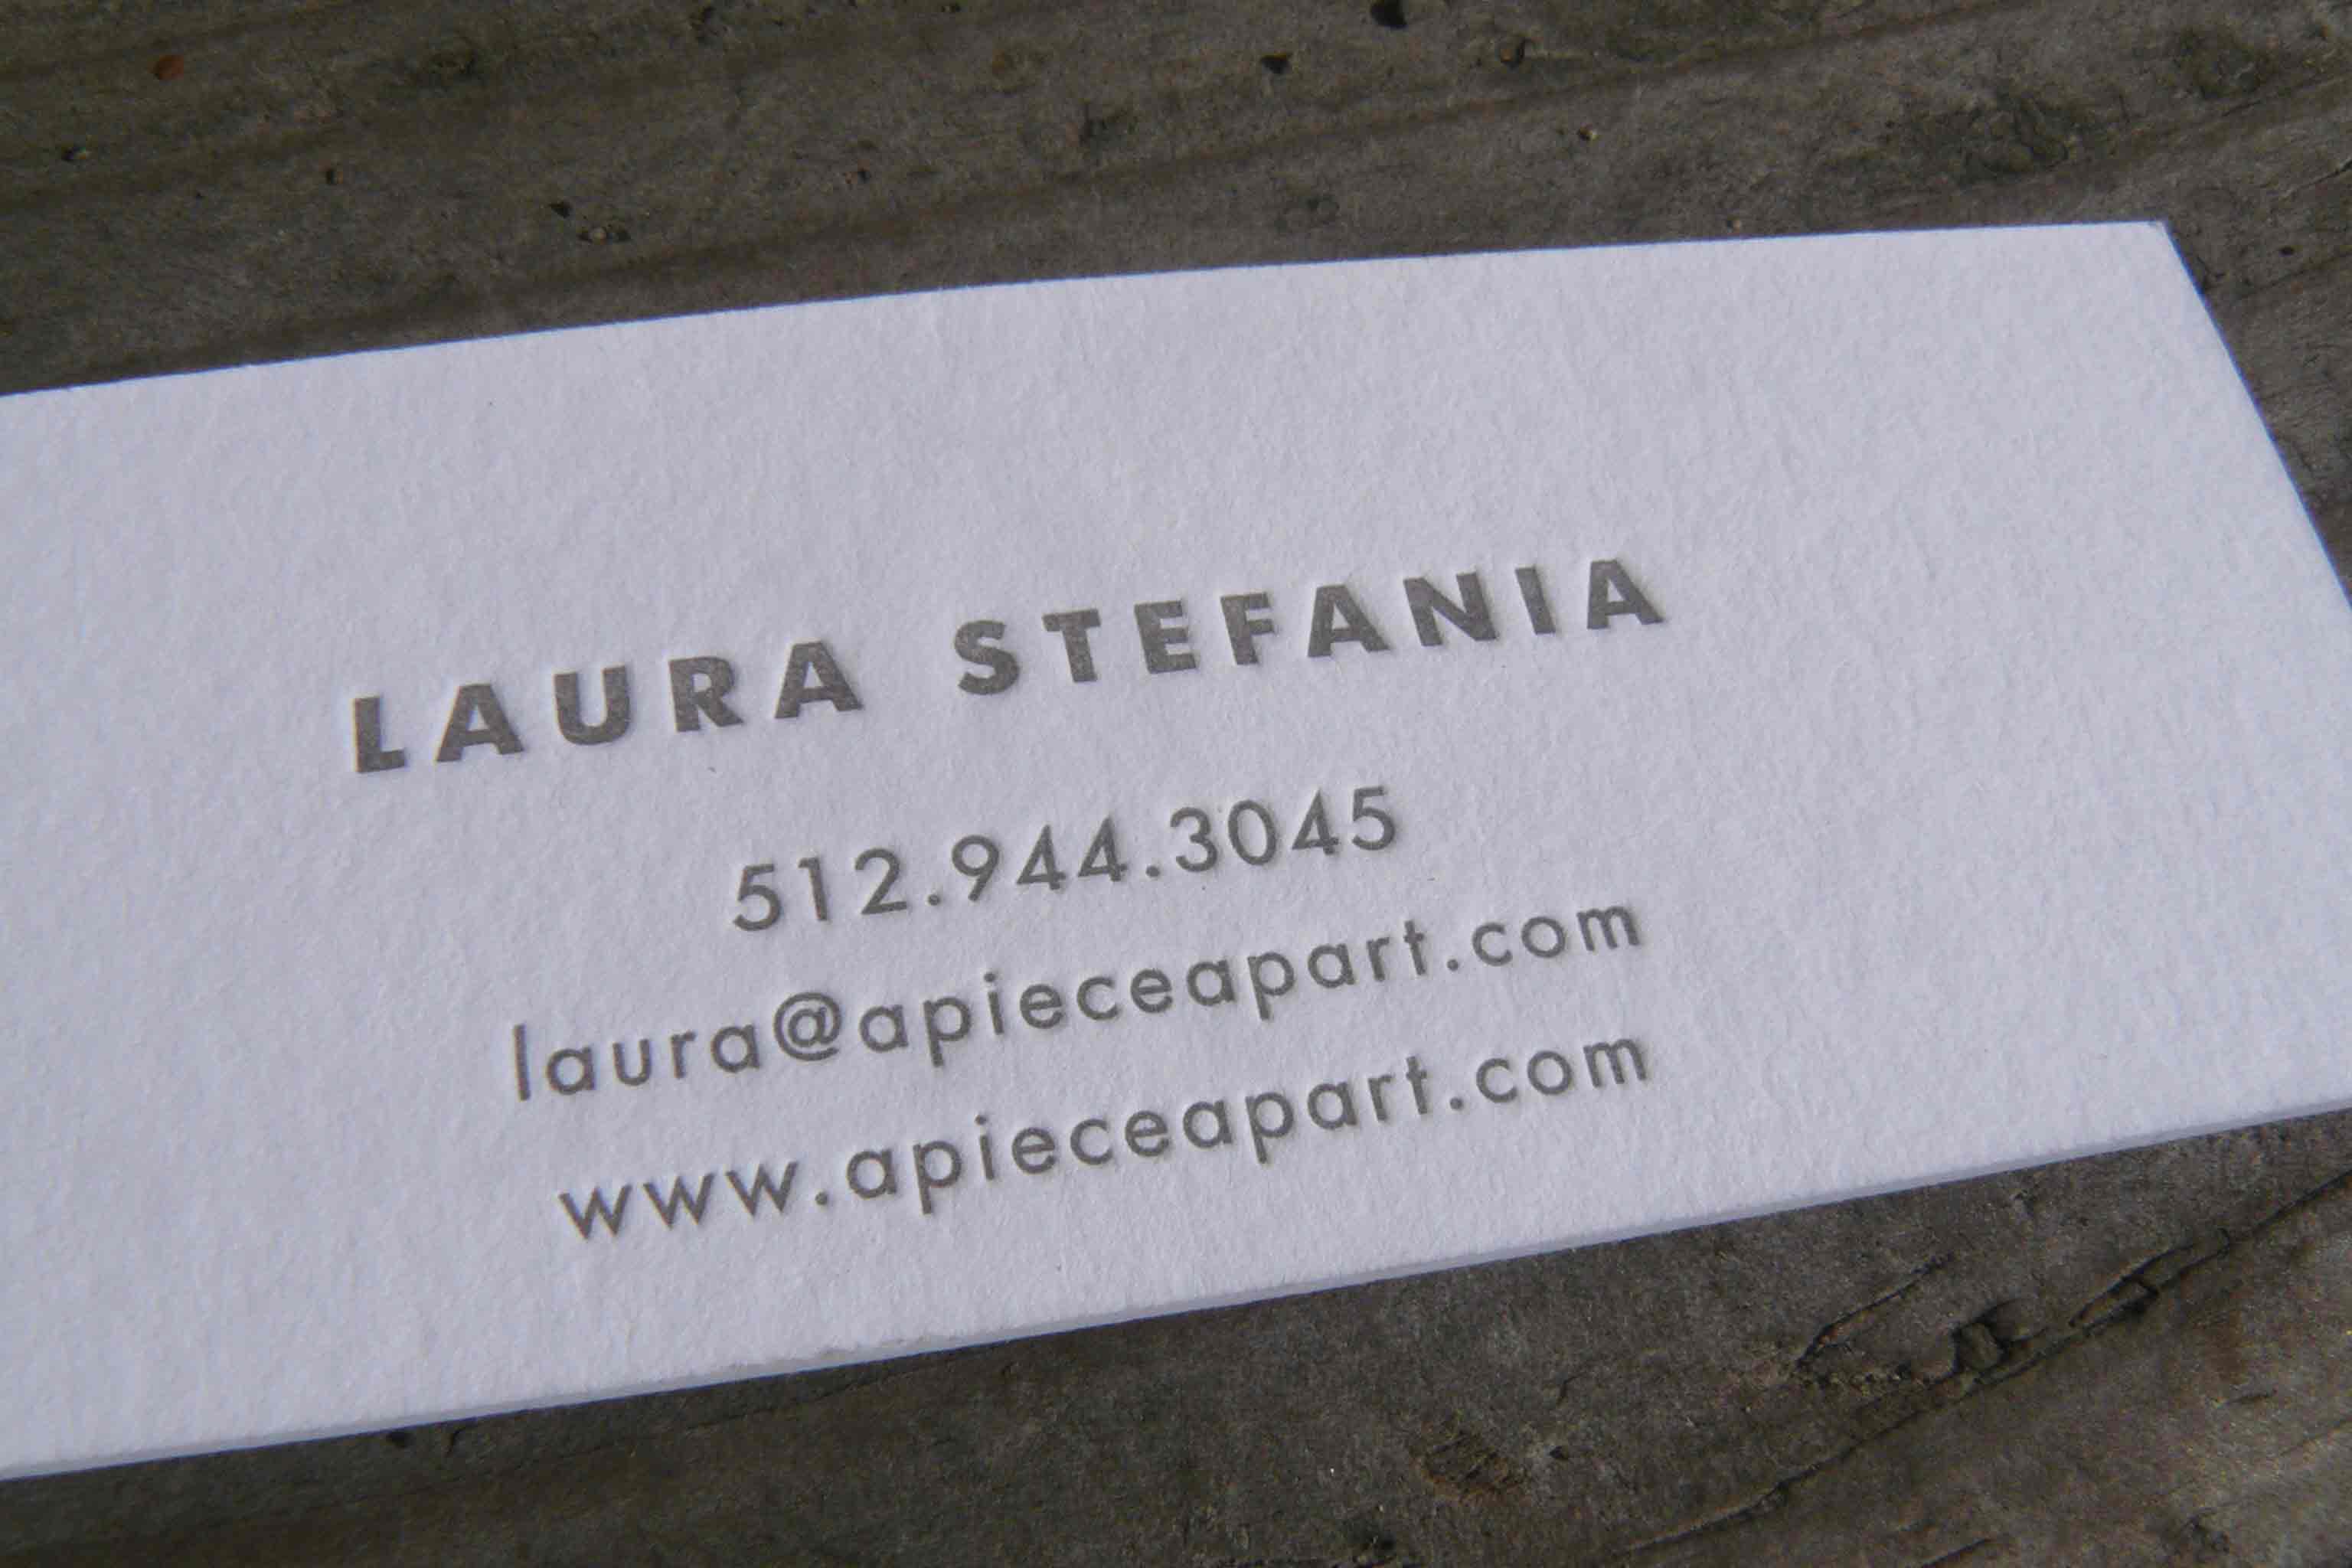 Apiece-Apart-back